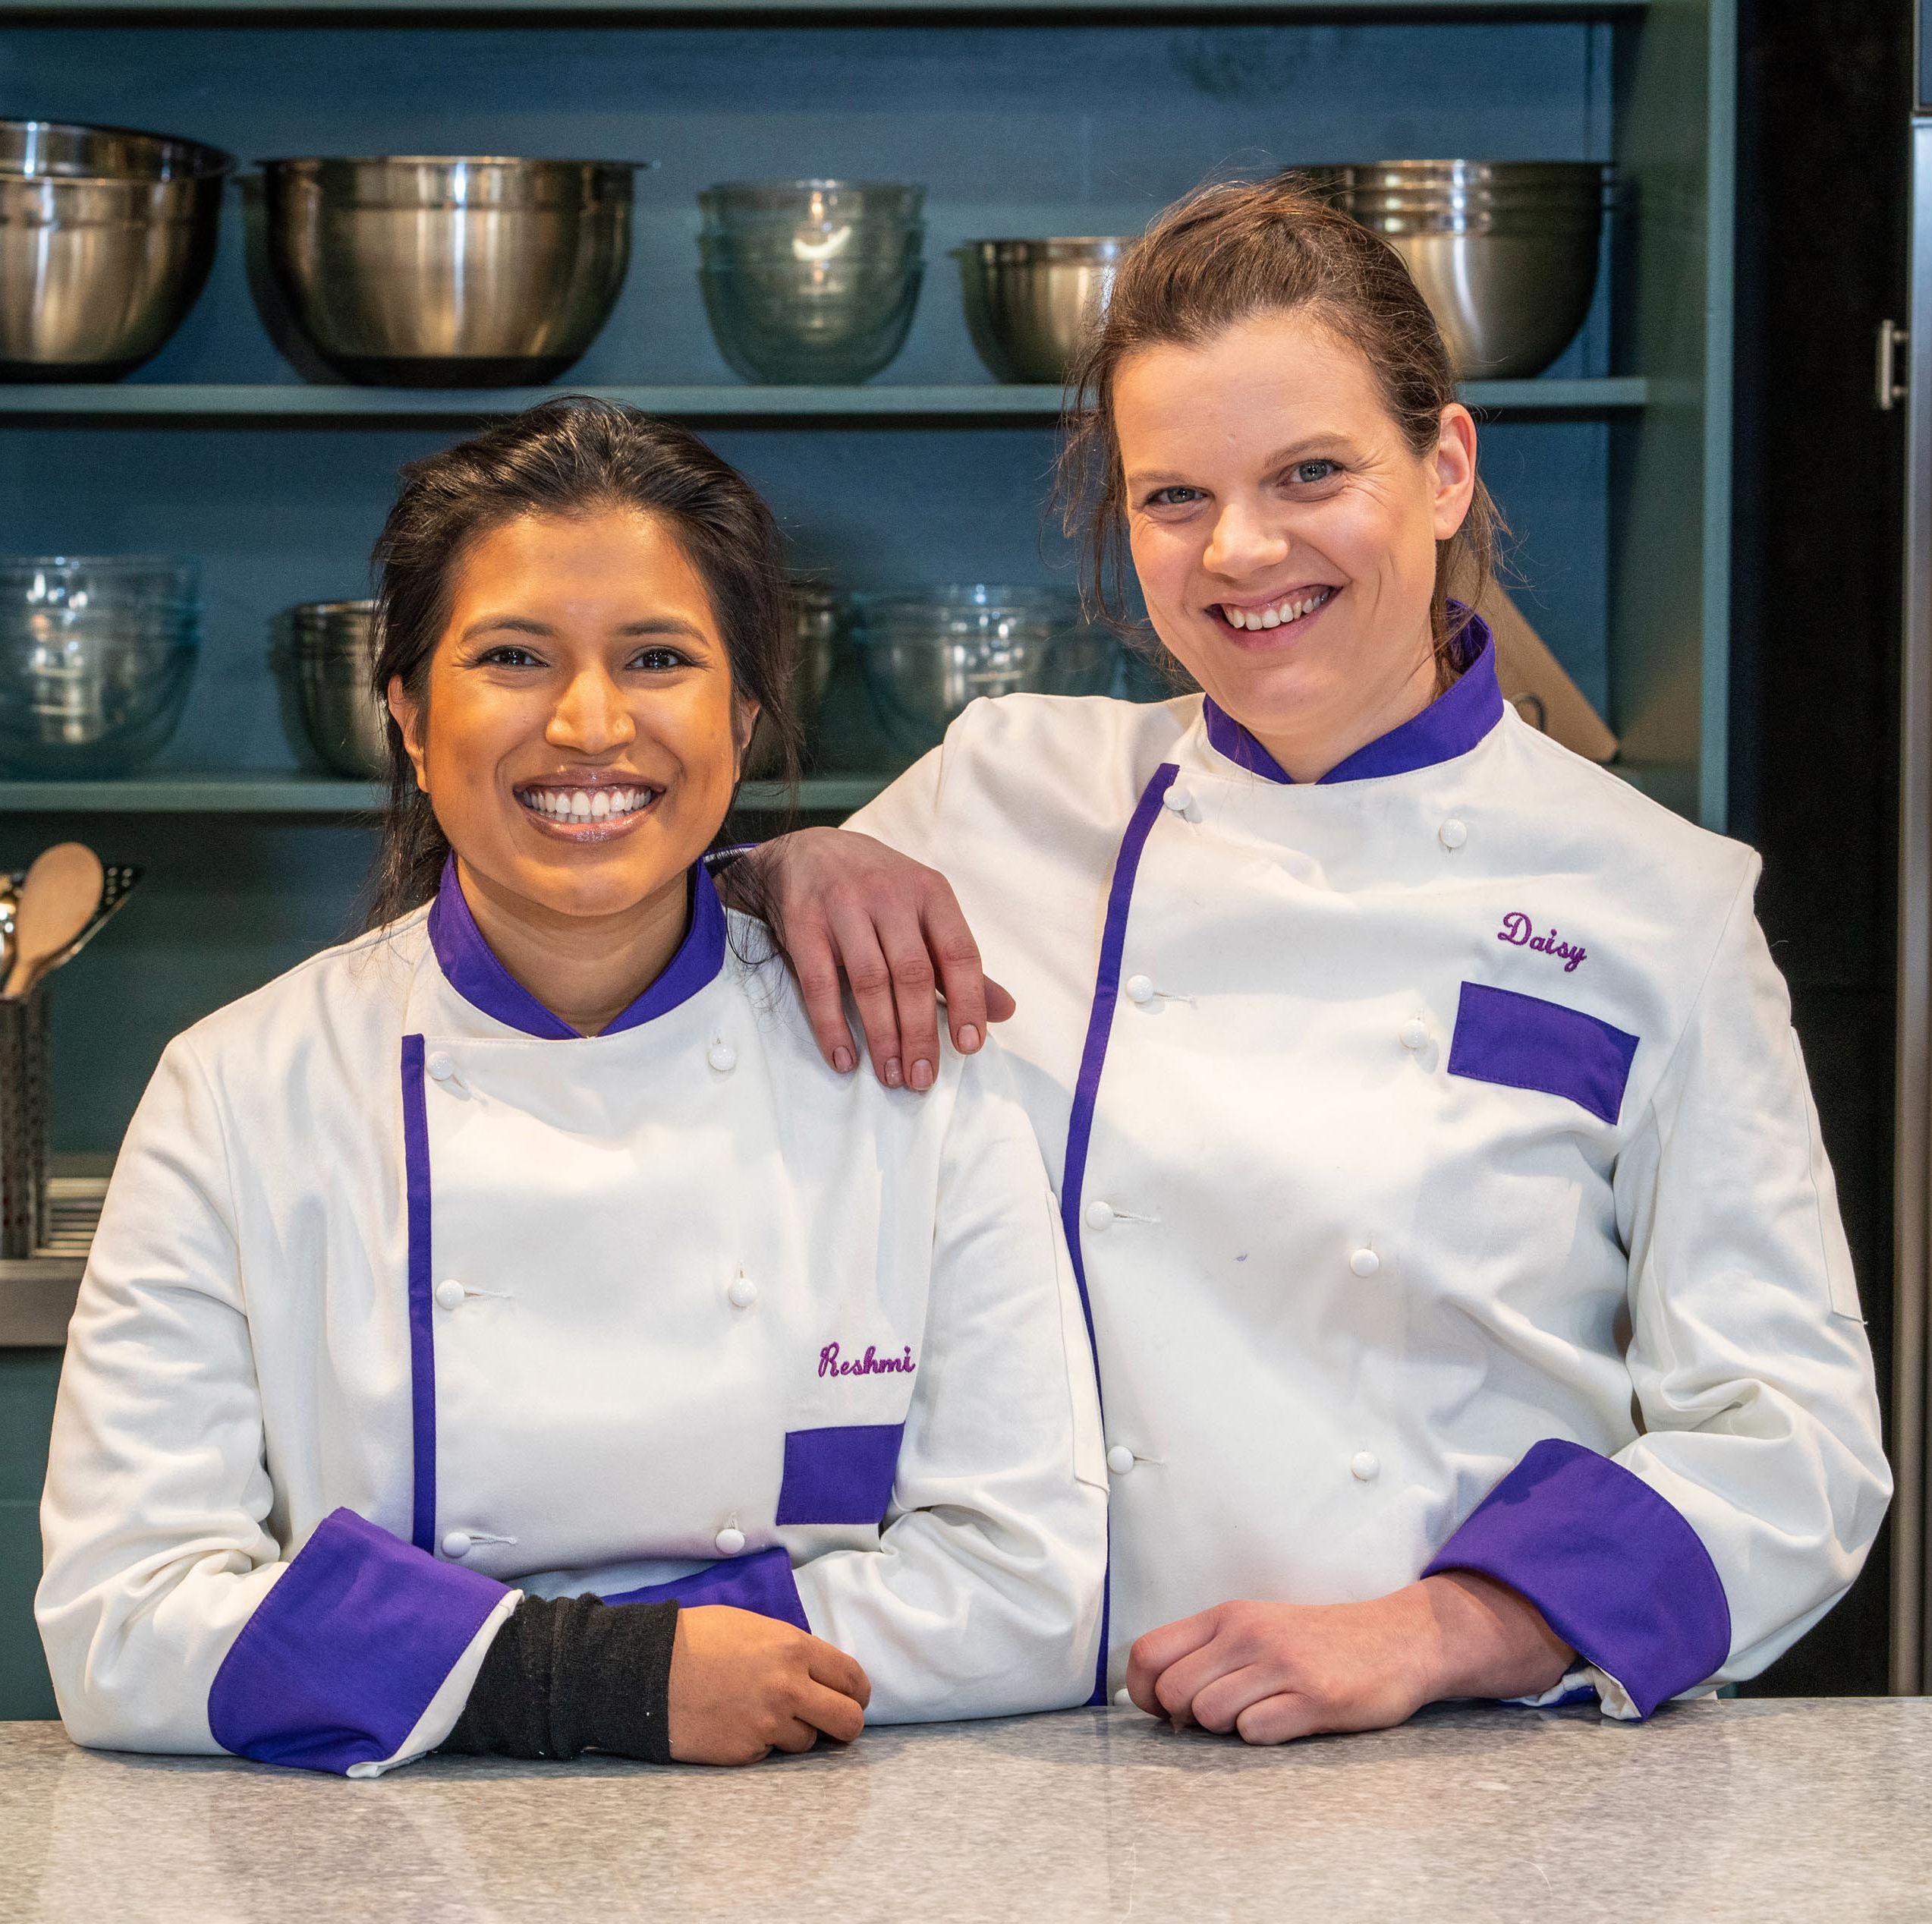 Bake Off: The Professionals 2019, Anges de Sucre team